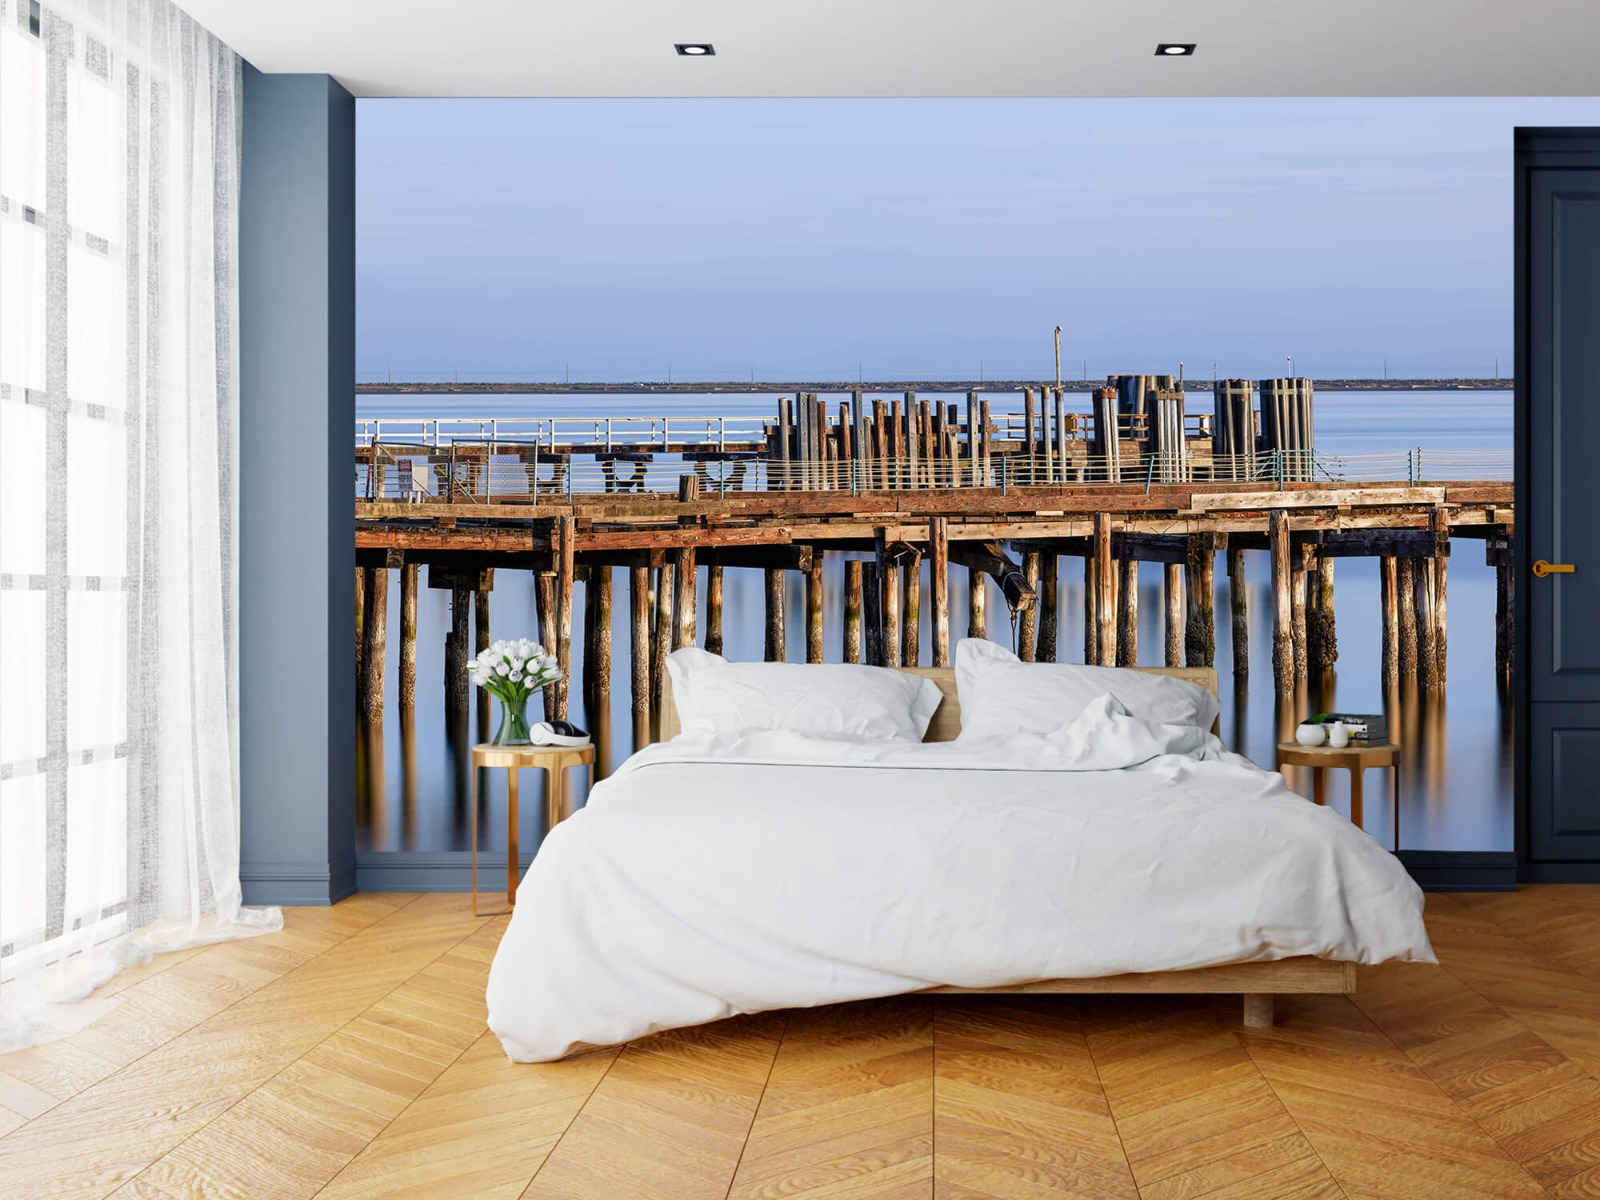 Houten Steigers - Steiger op houten palen - Wallexclusive - Slaapkamer 15